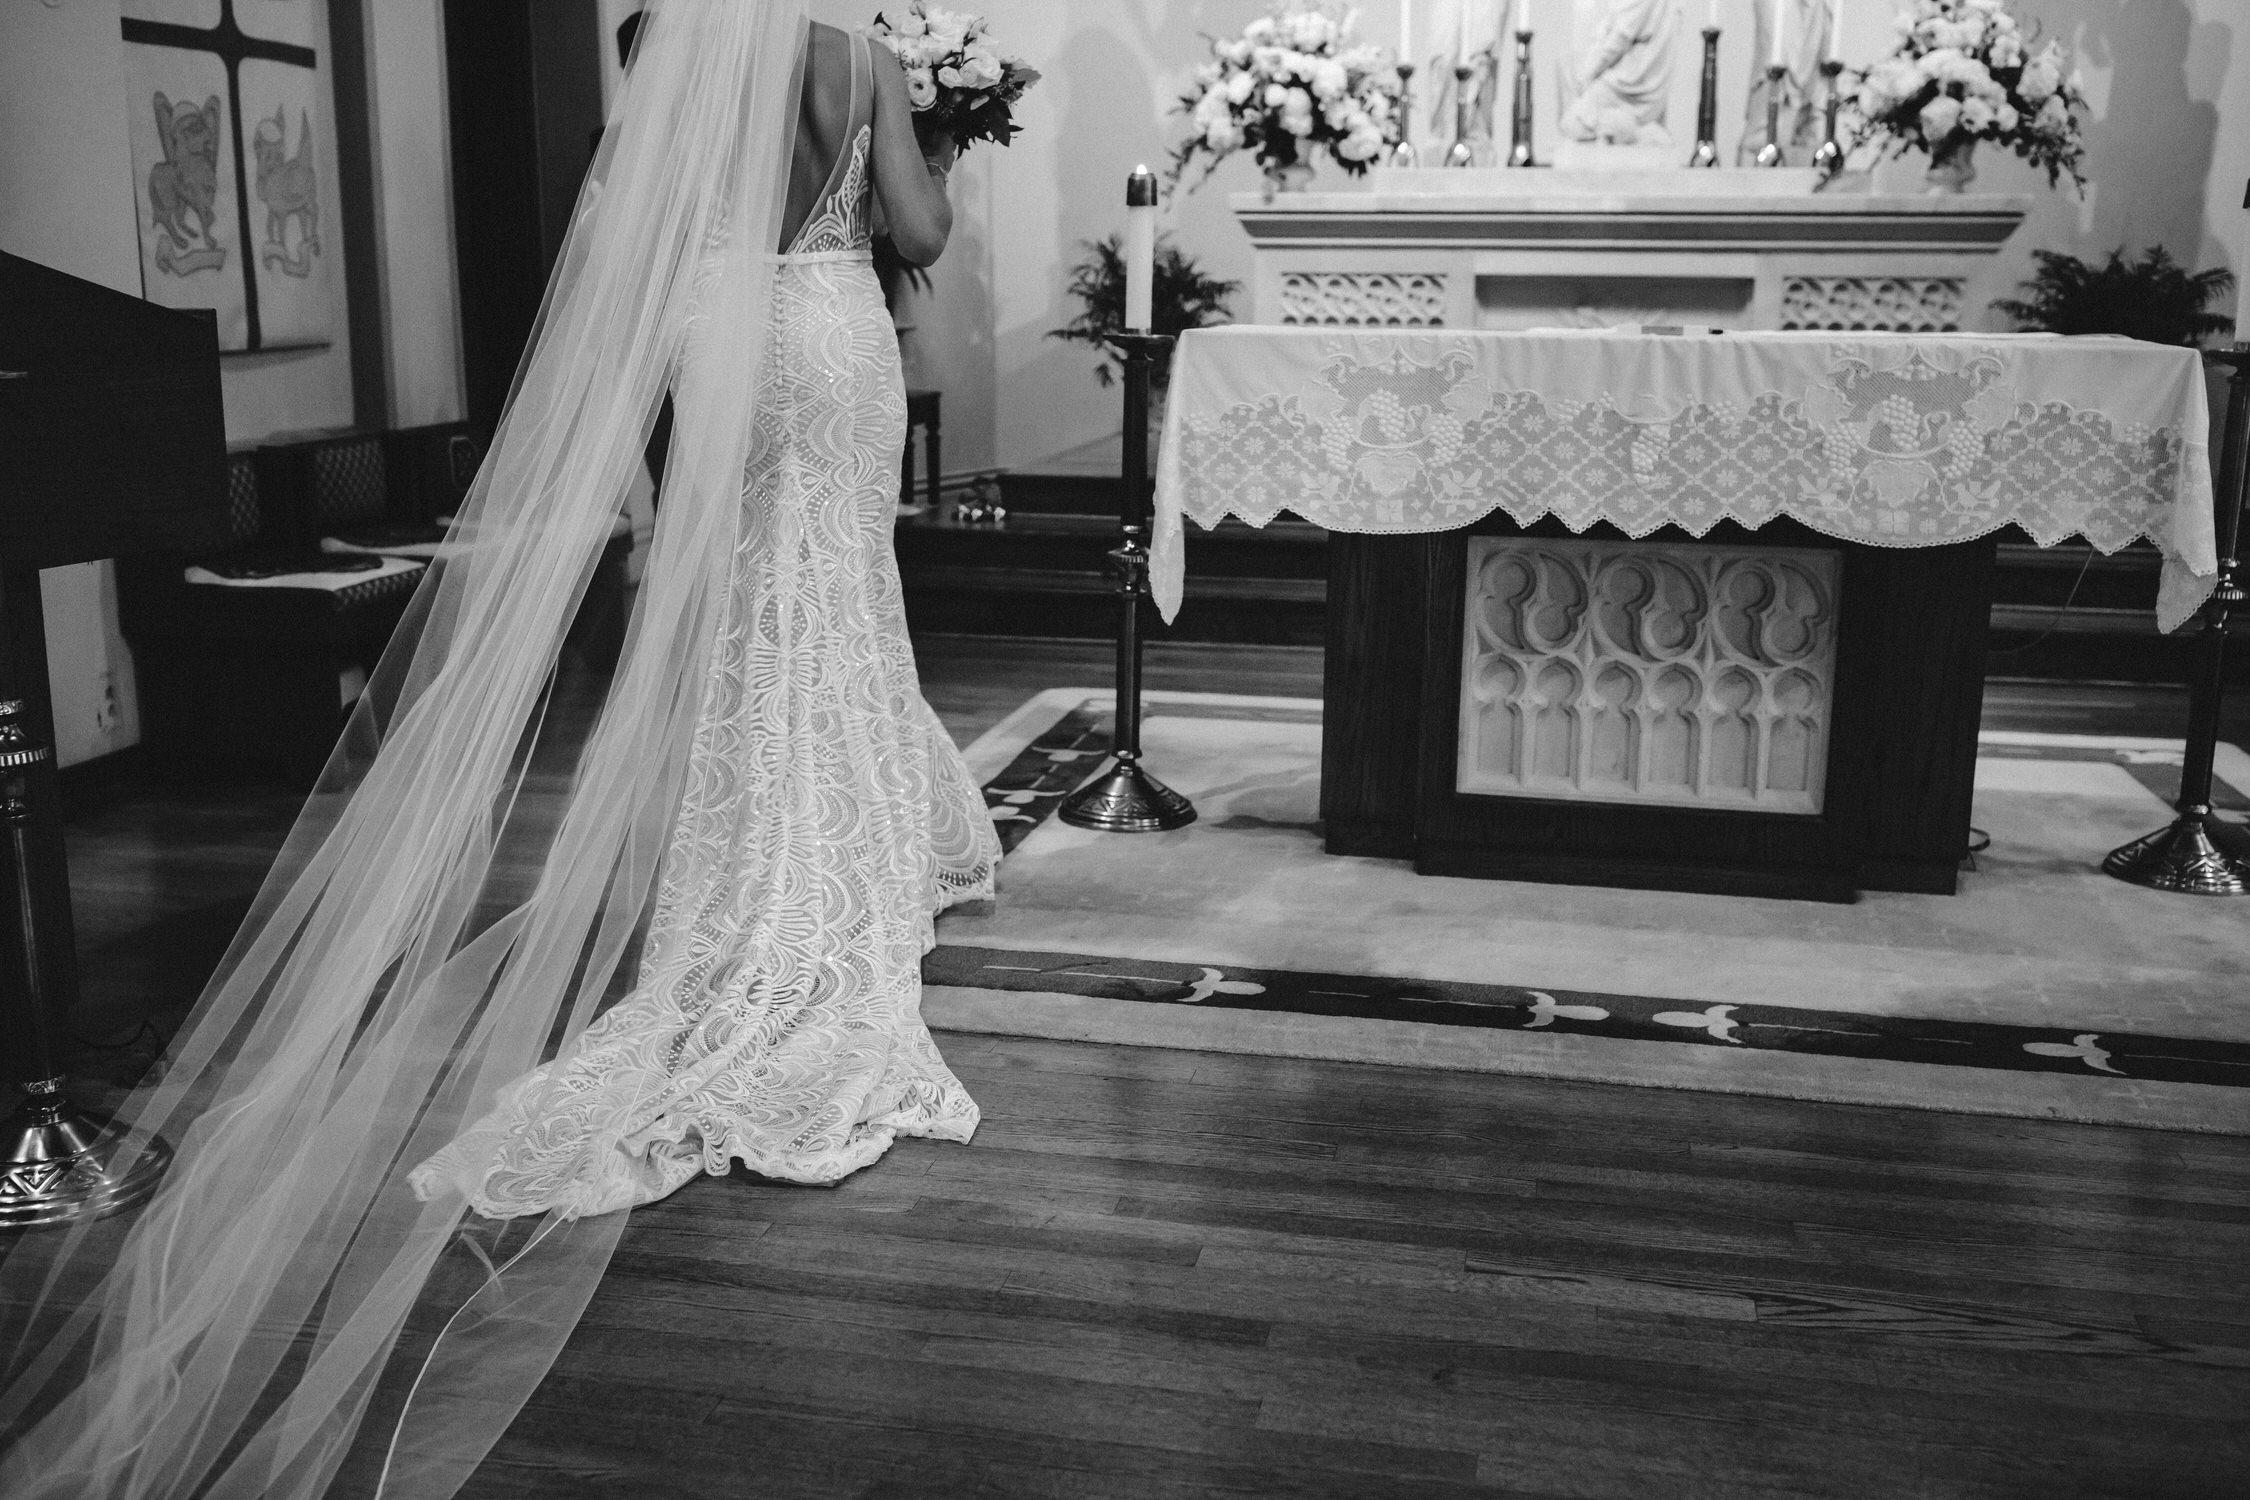 Church wedding, st louis missouri, wedding photographer